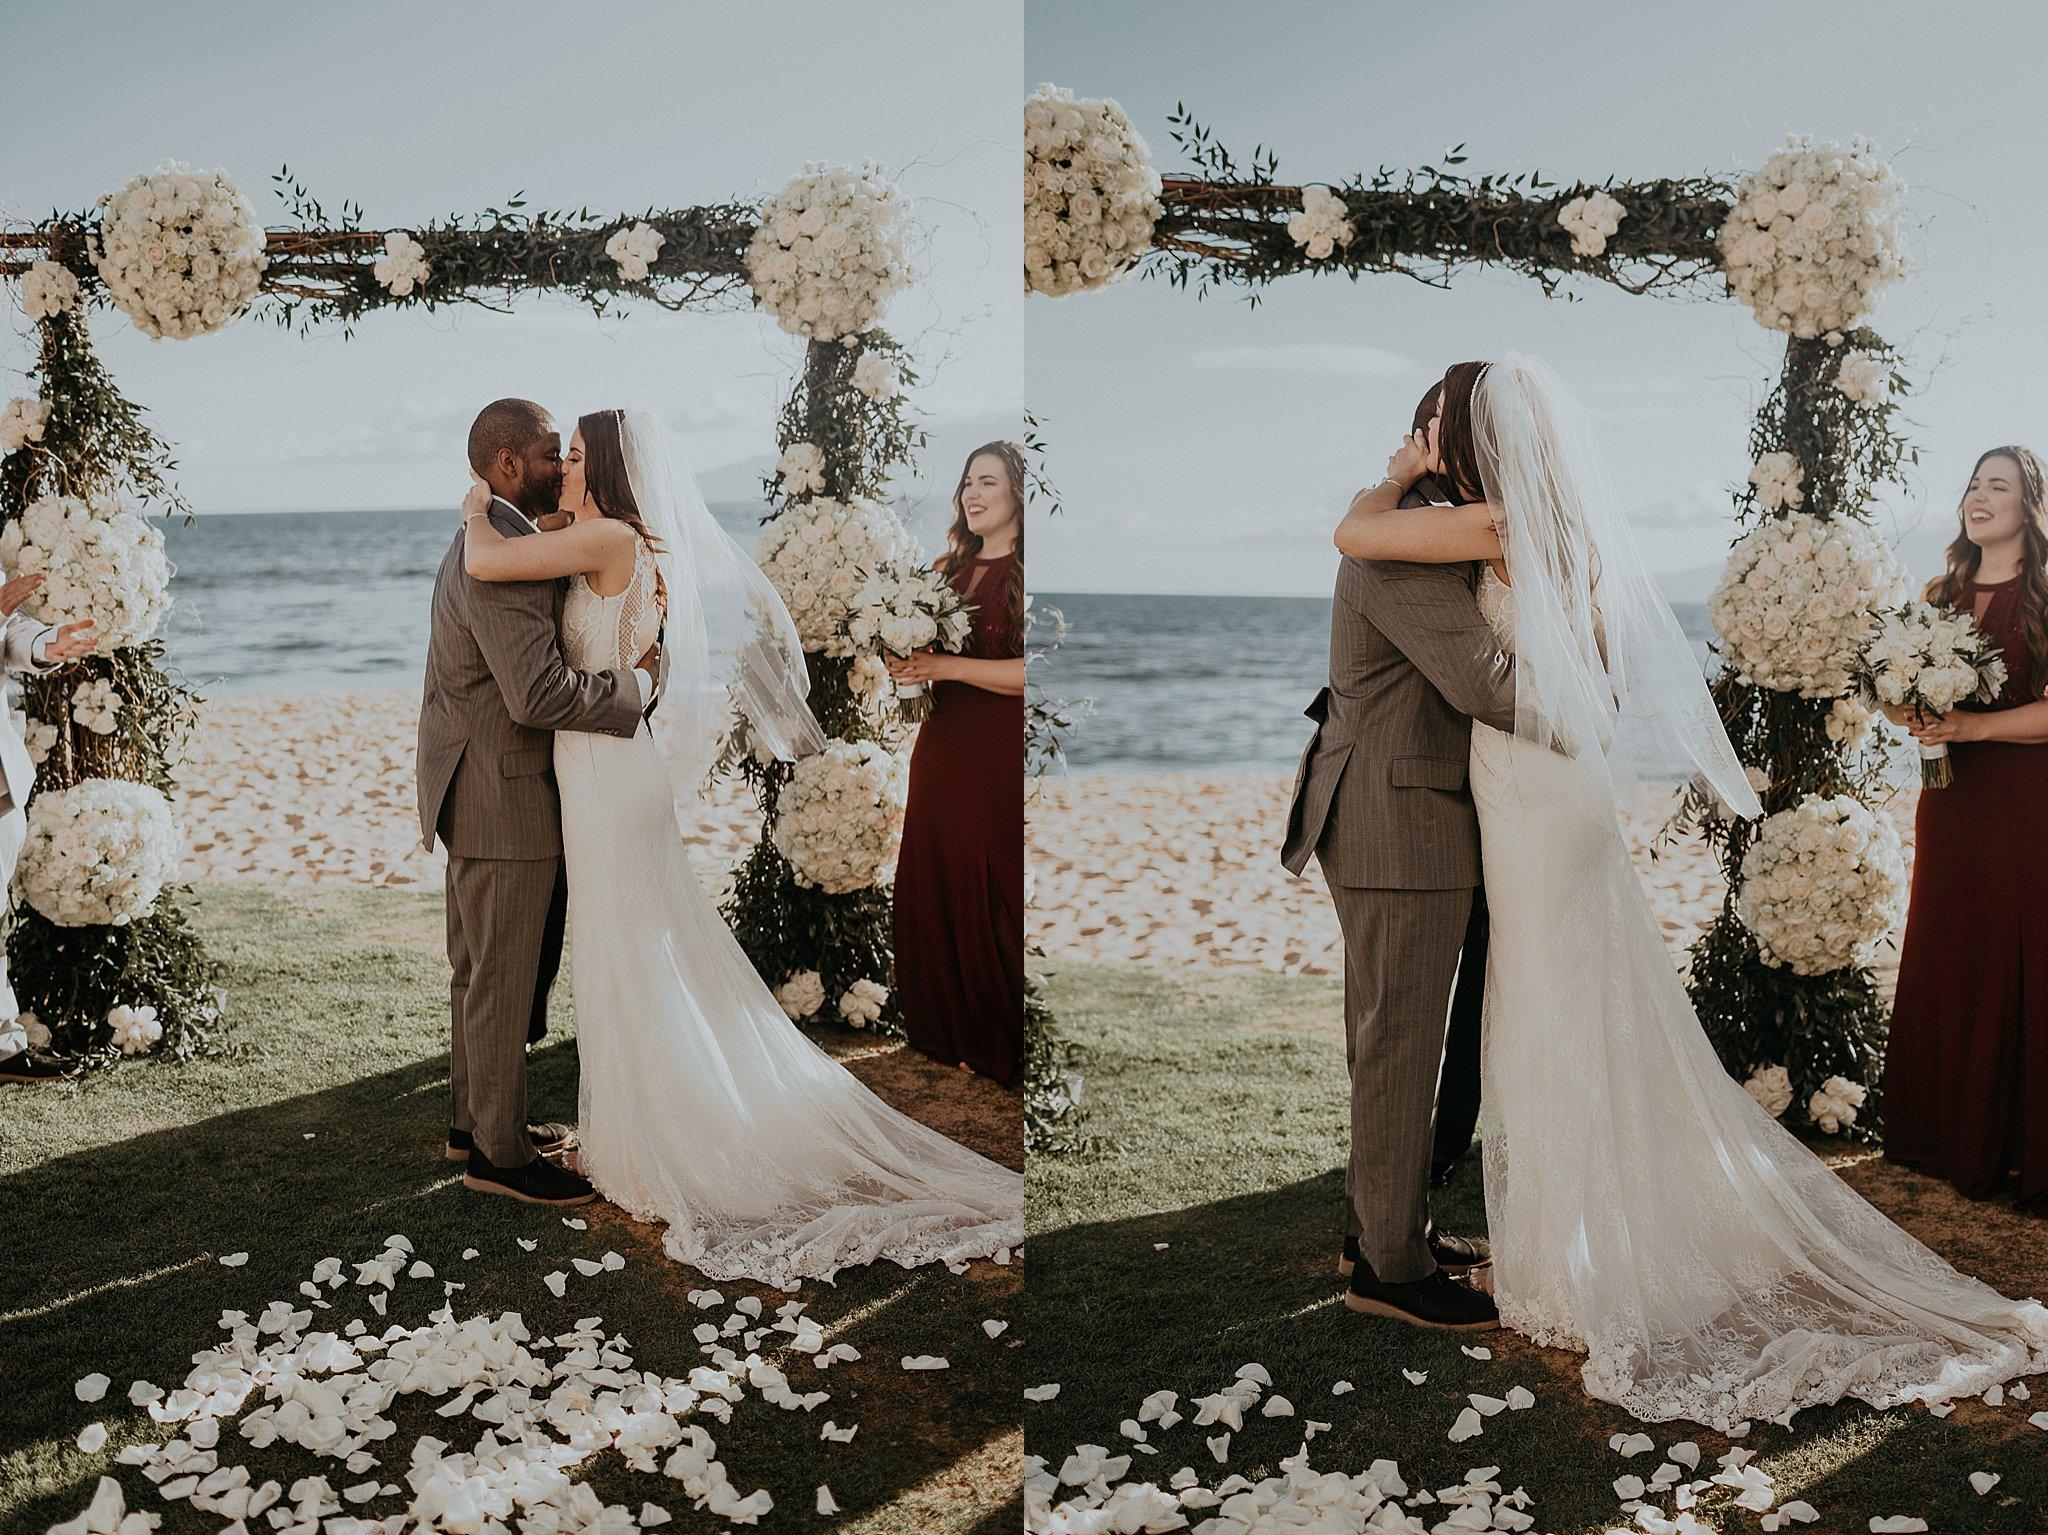 samantha_mcfarlen_bellingham_washington_engagement_photography_seattle_wedding_photographer_0212.jpg